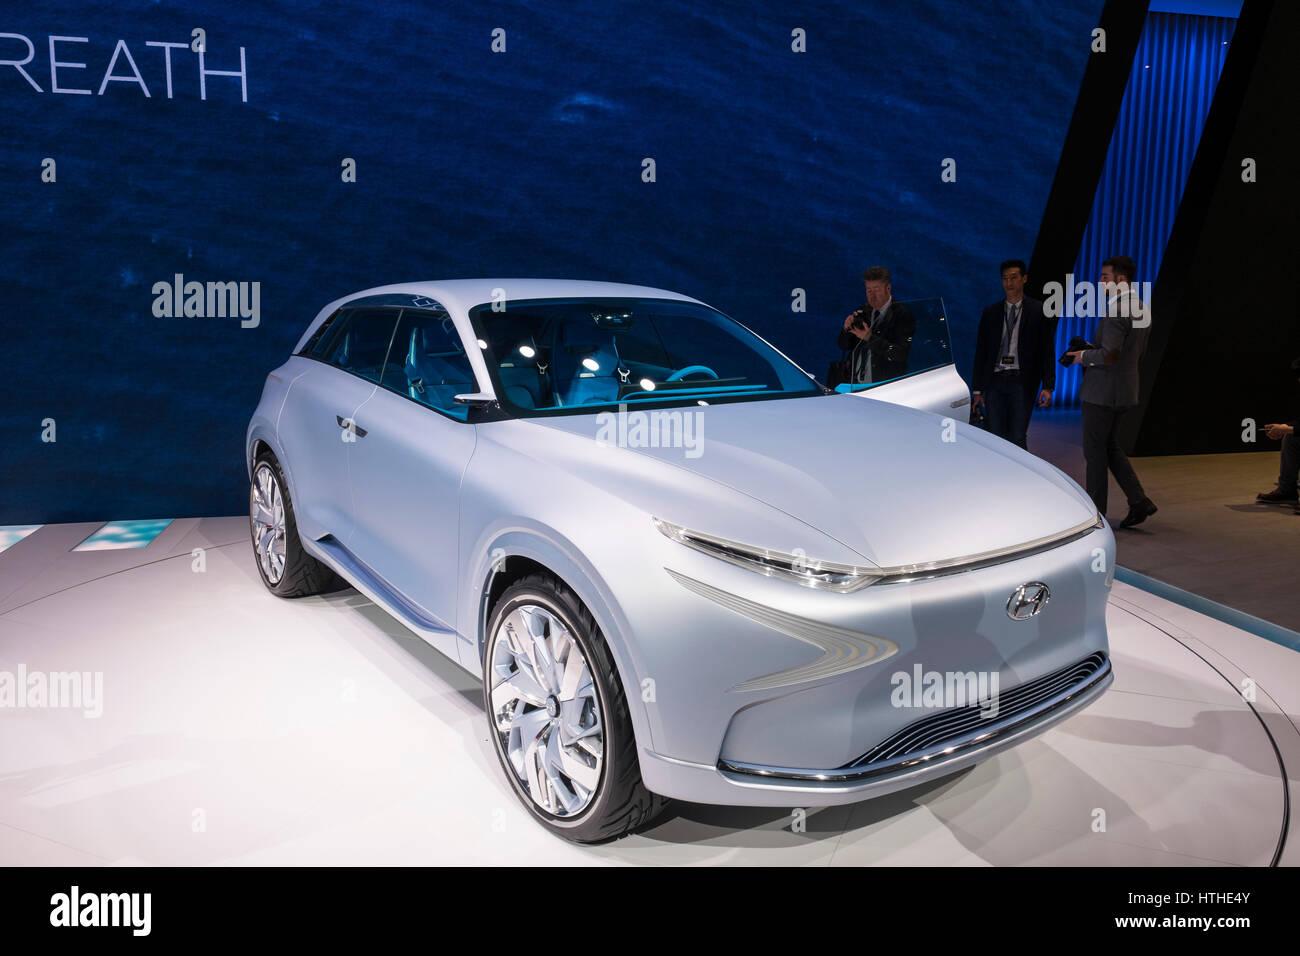 Hyundai FE concept - new Fuel cell SUV at 87th Geneva International Motor Show in Geneva Switzerland 2017 - Stock Image